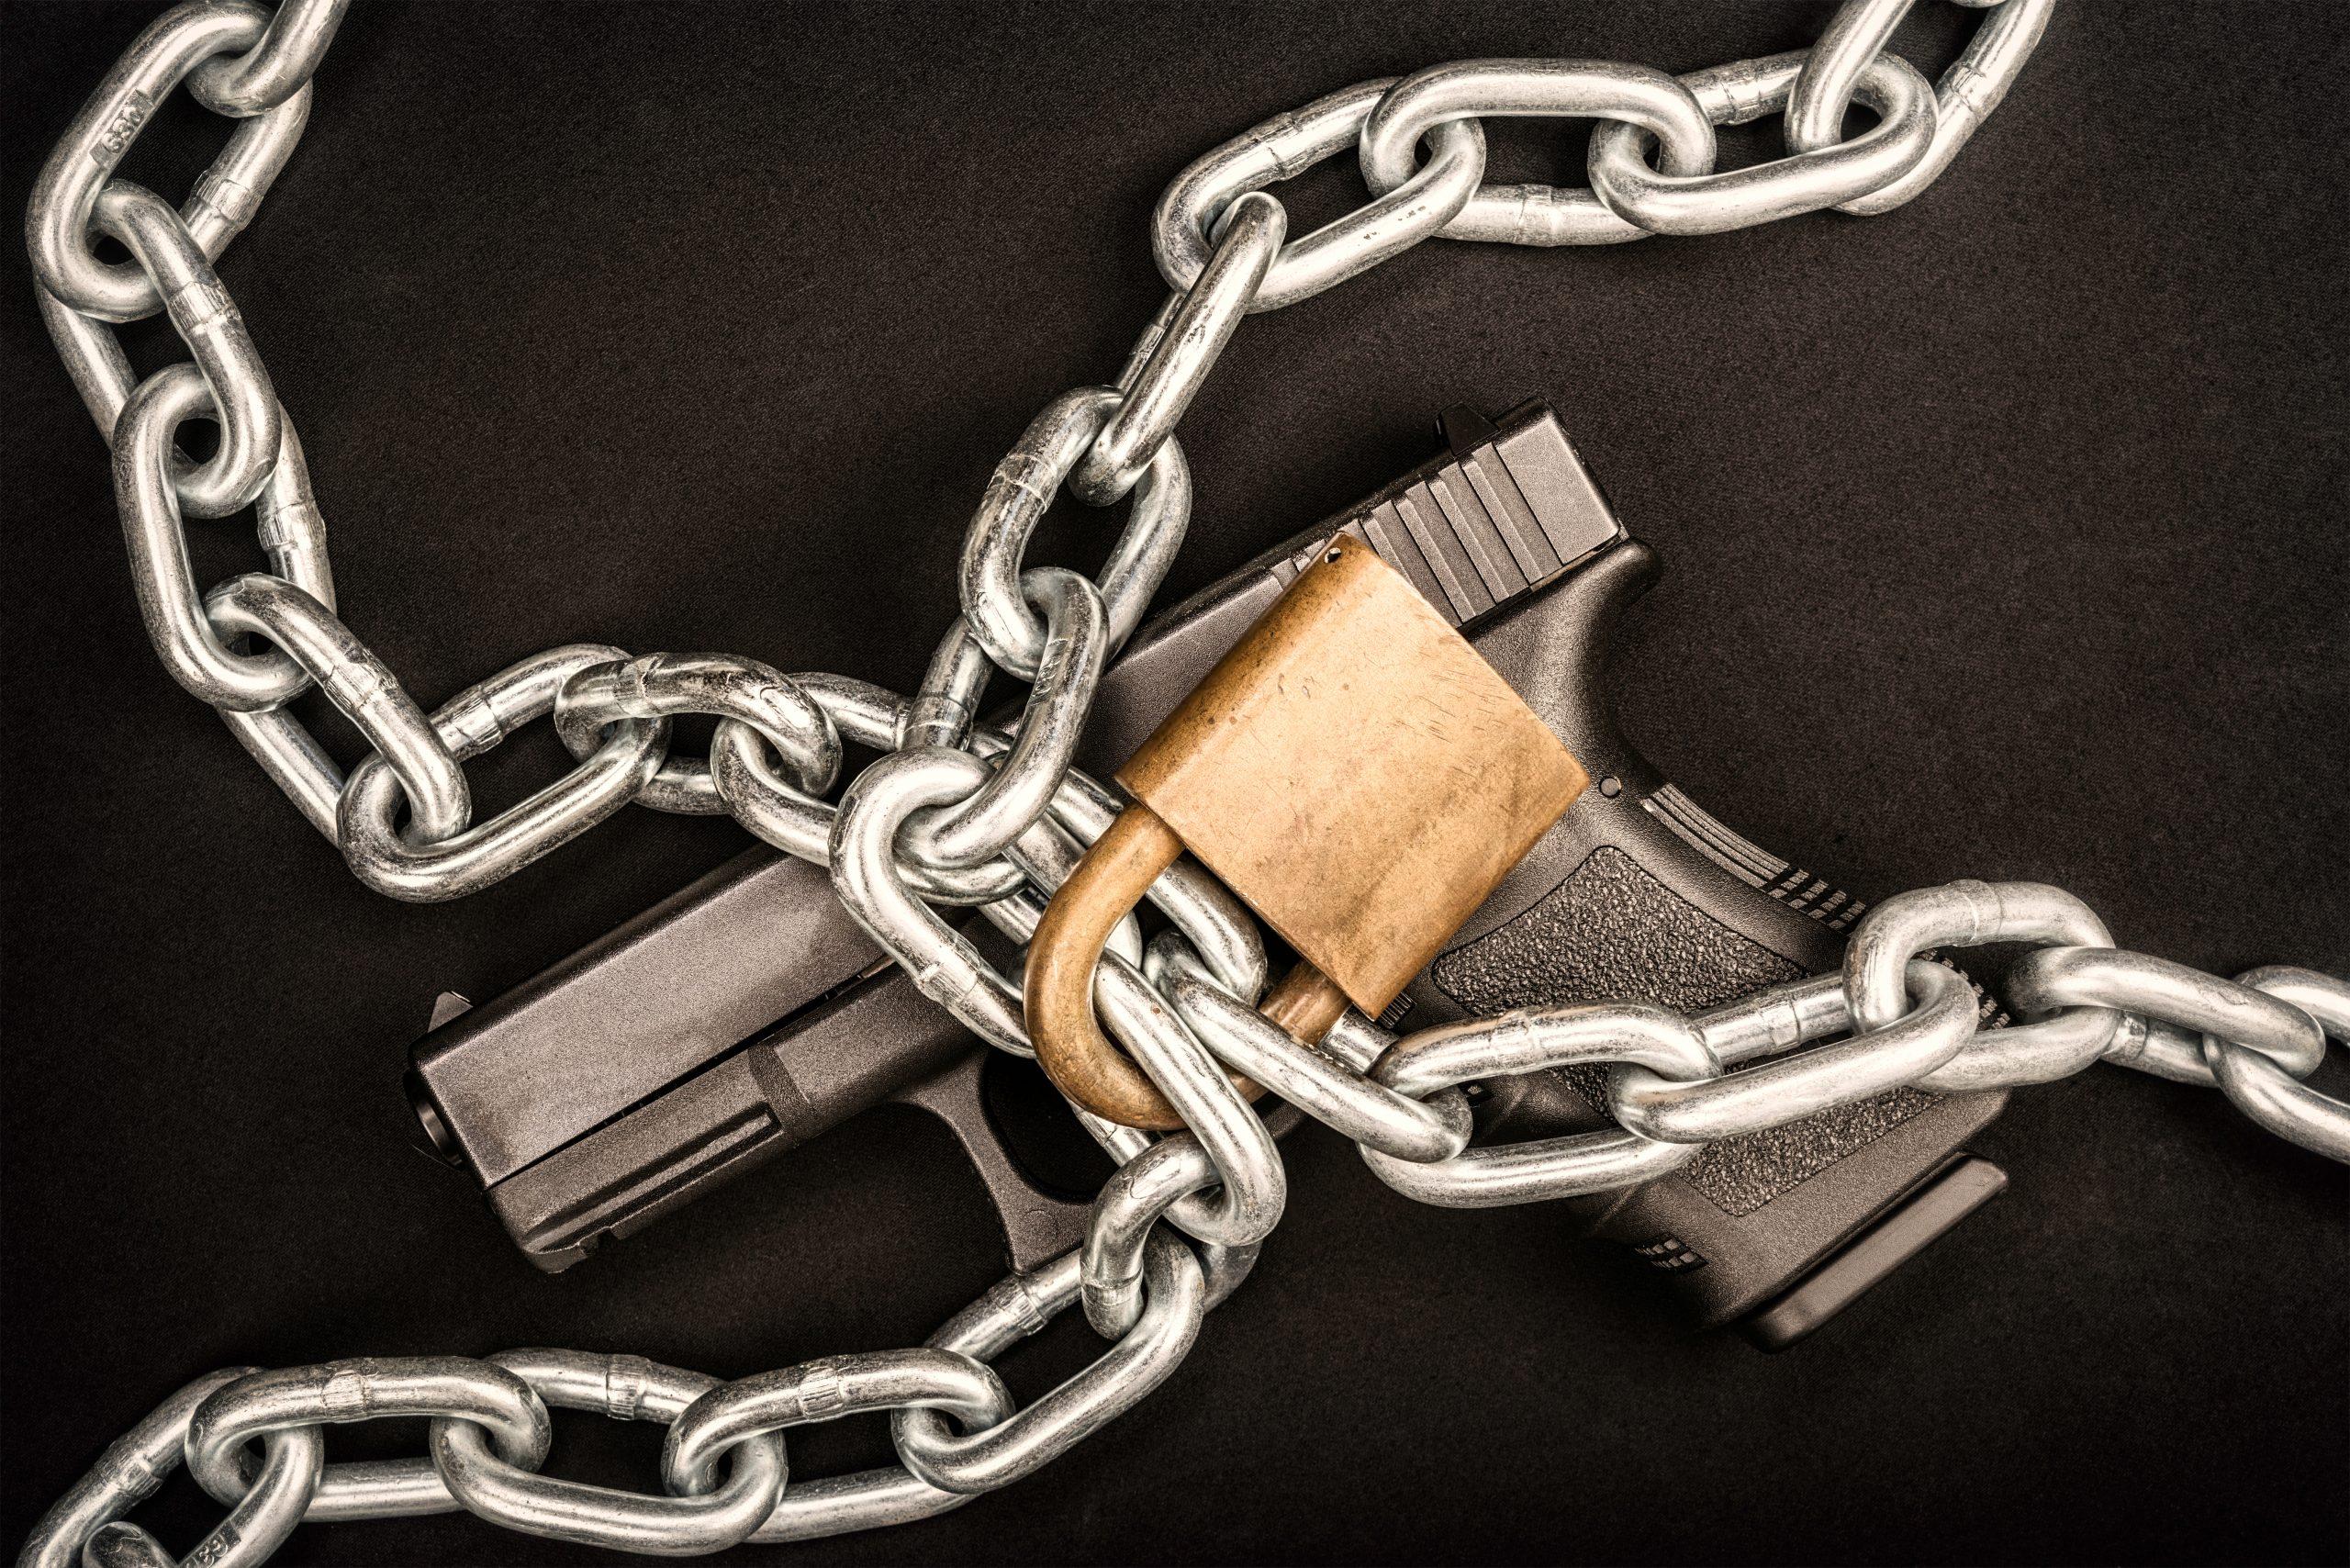 200 More Agents to Enforce Gun Control!